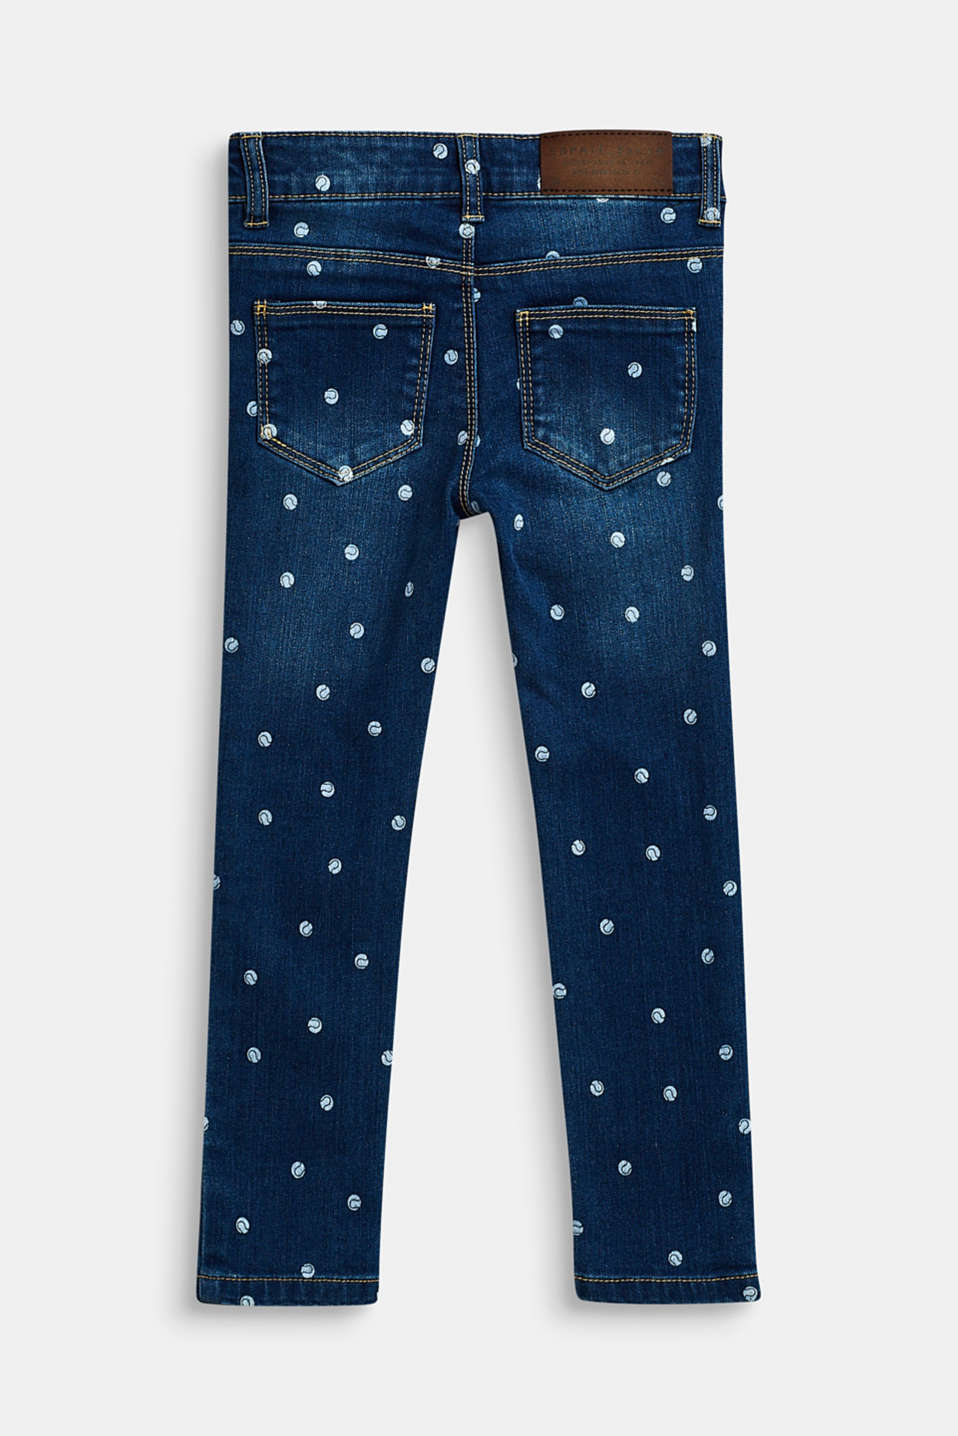 Stretch jeans with an adjustable waist, DARK INDIGO DE, detail image number 1